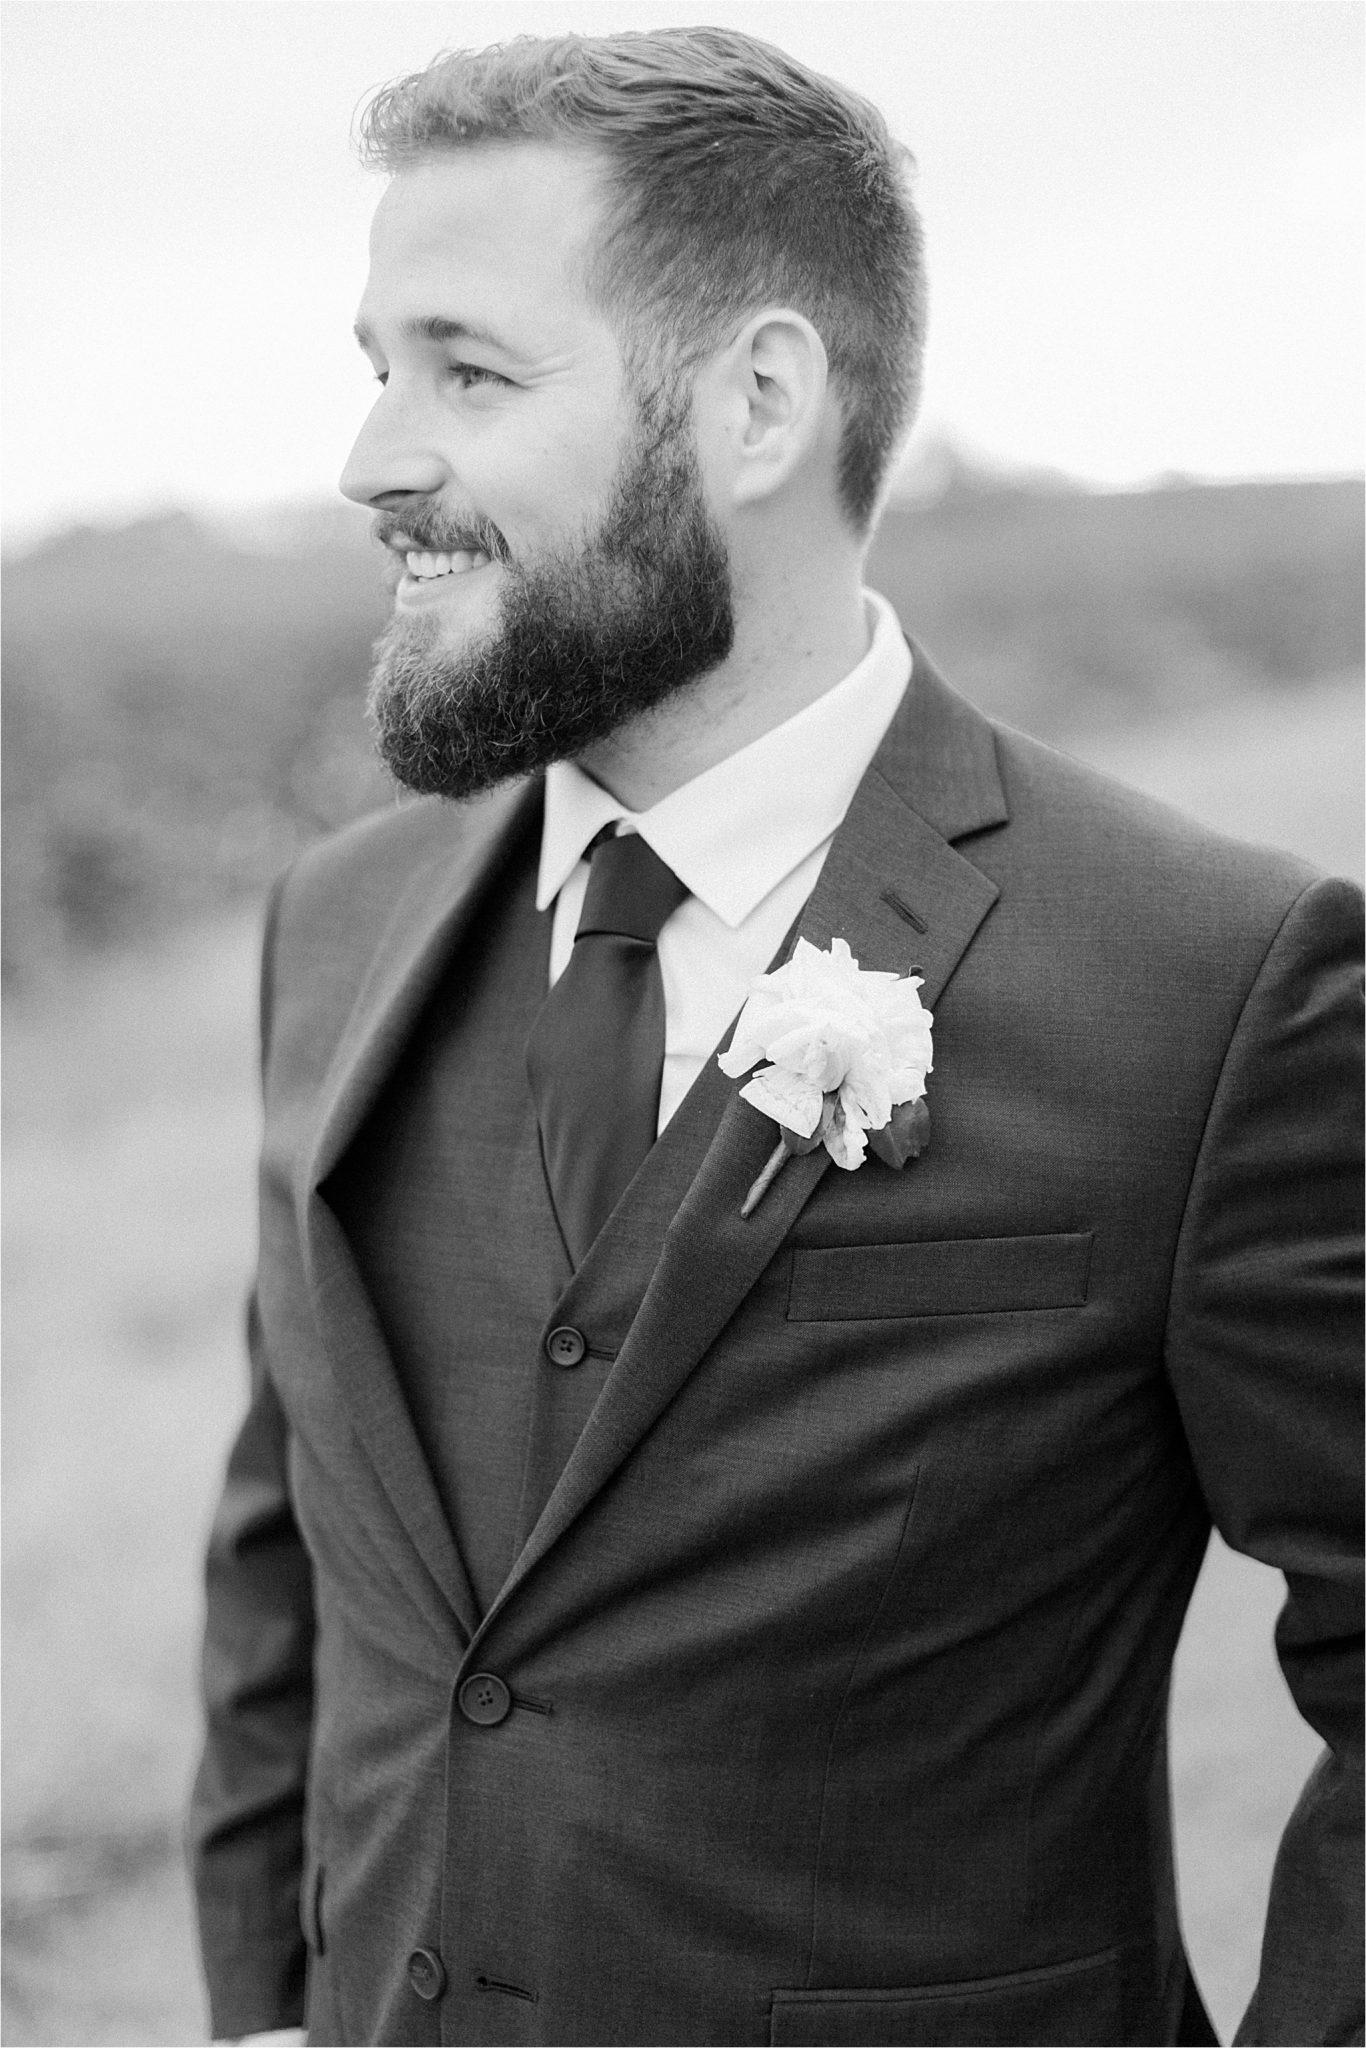 wedding day-groom-long beard-strong beard-groomed beard